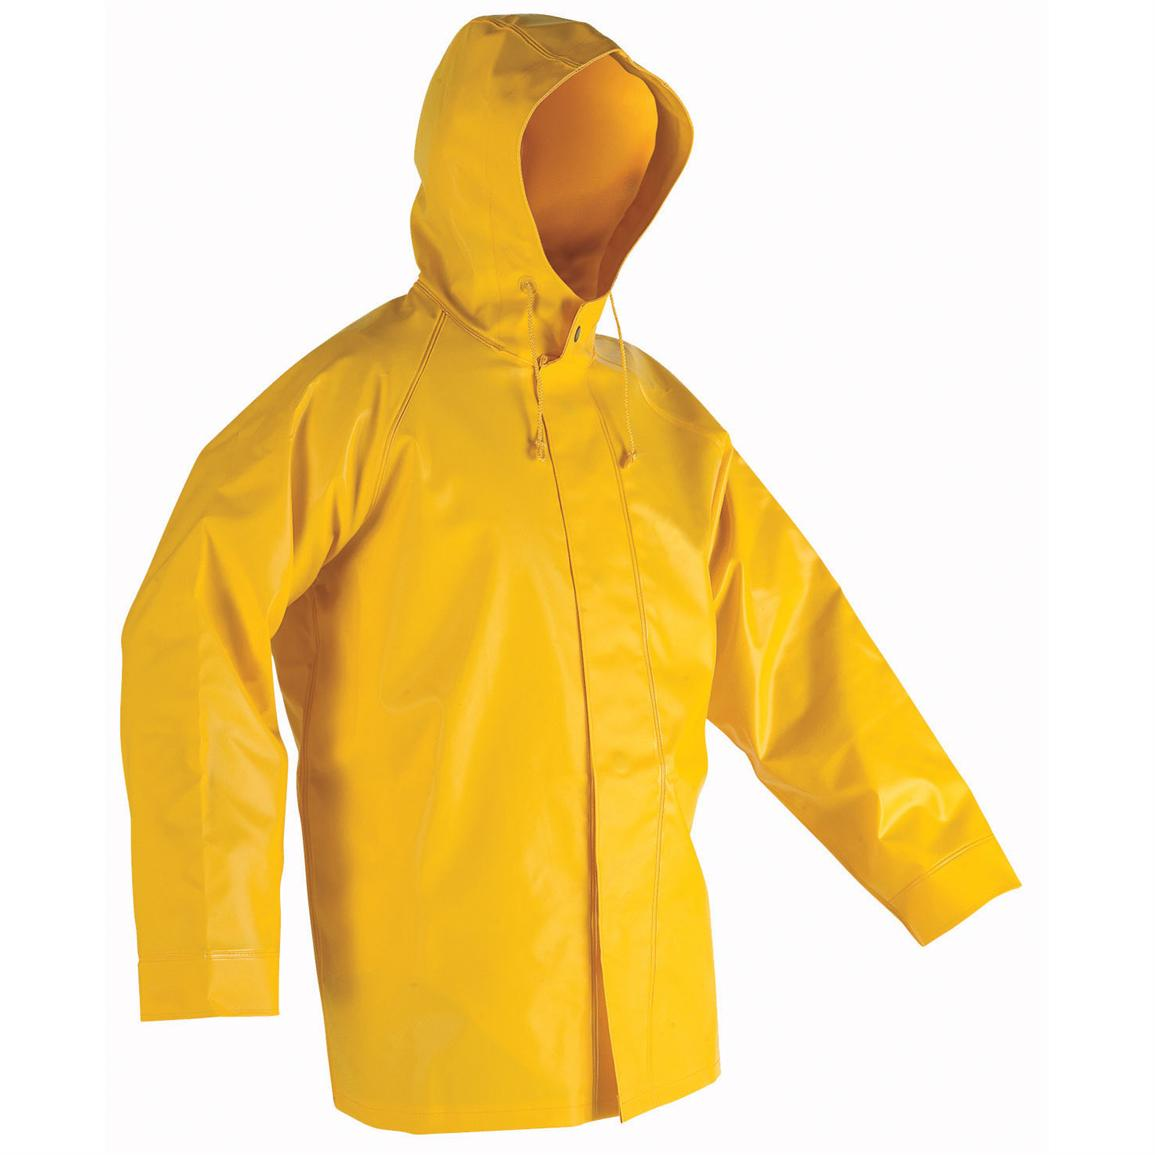 Coat clipart rain gear Rain Clipart (40+) stearns Jacket